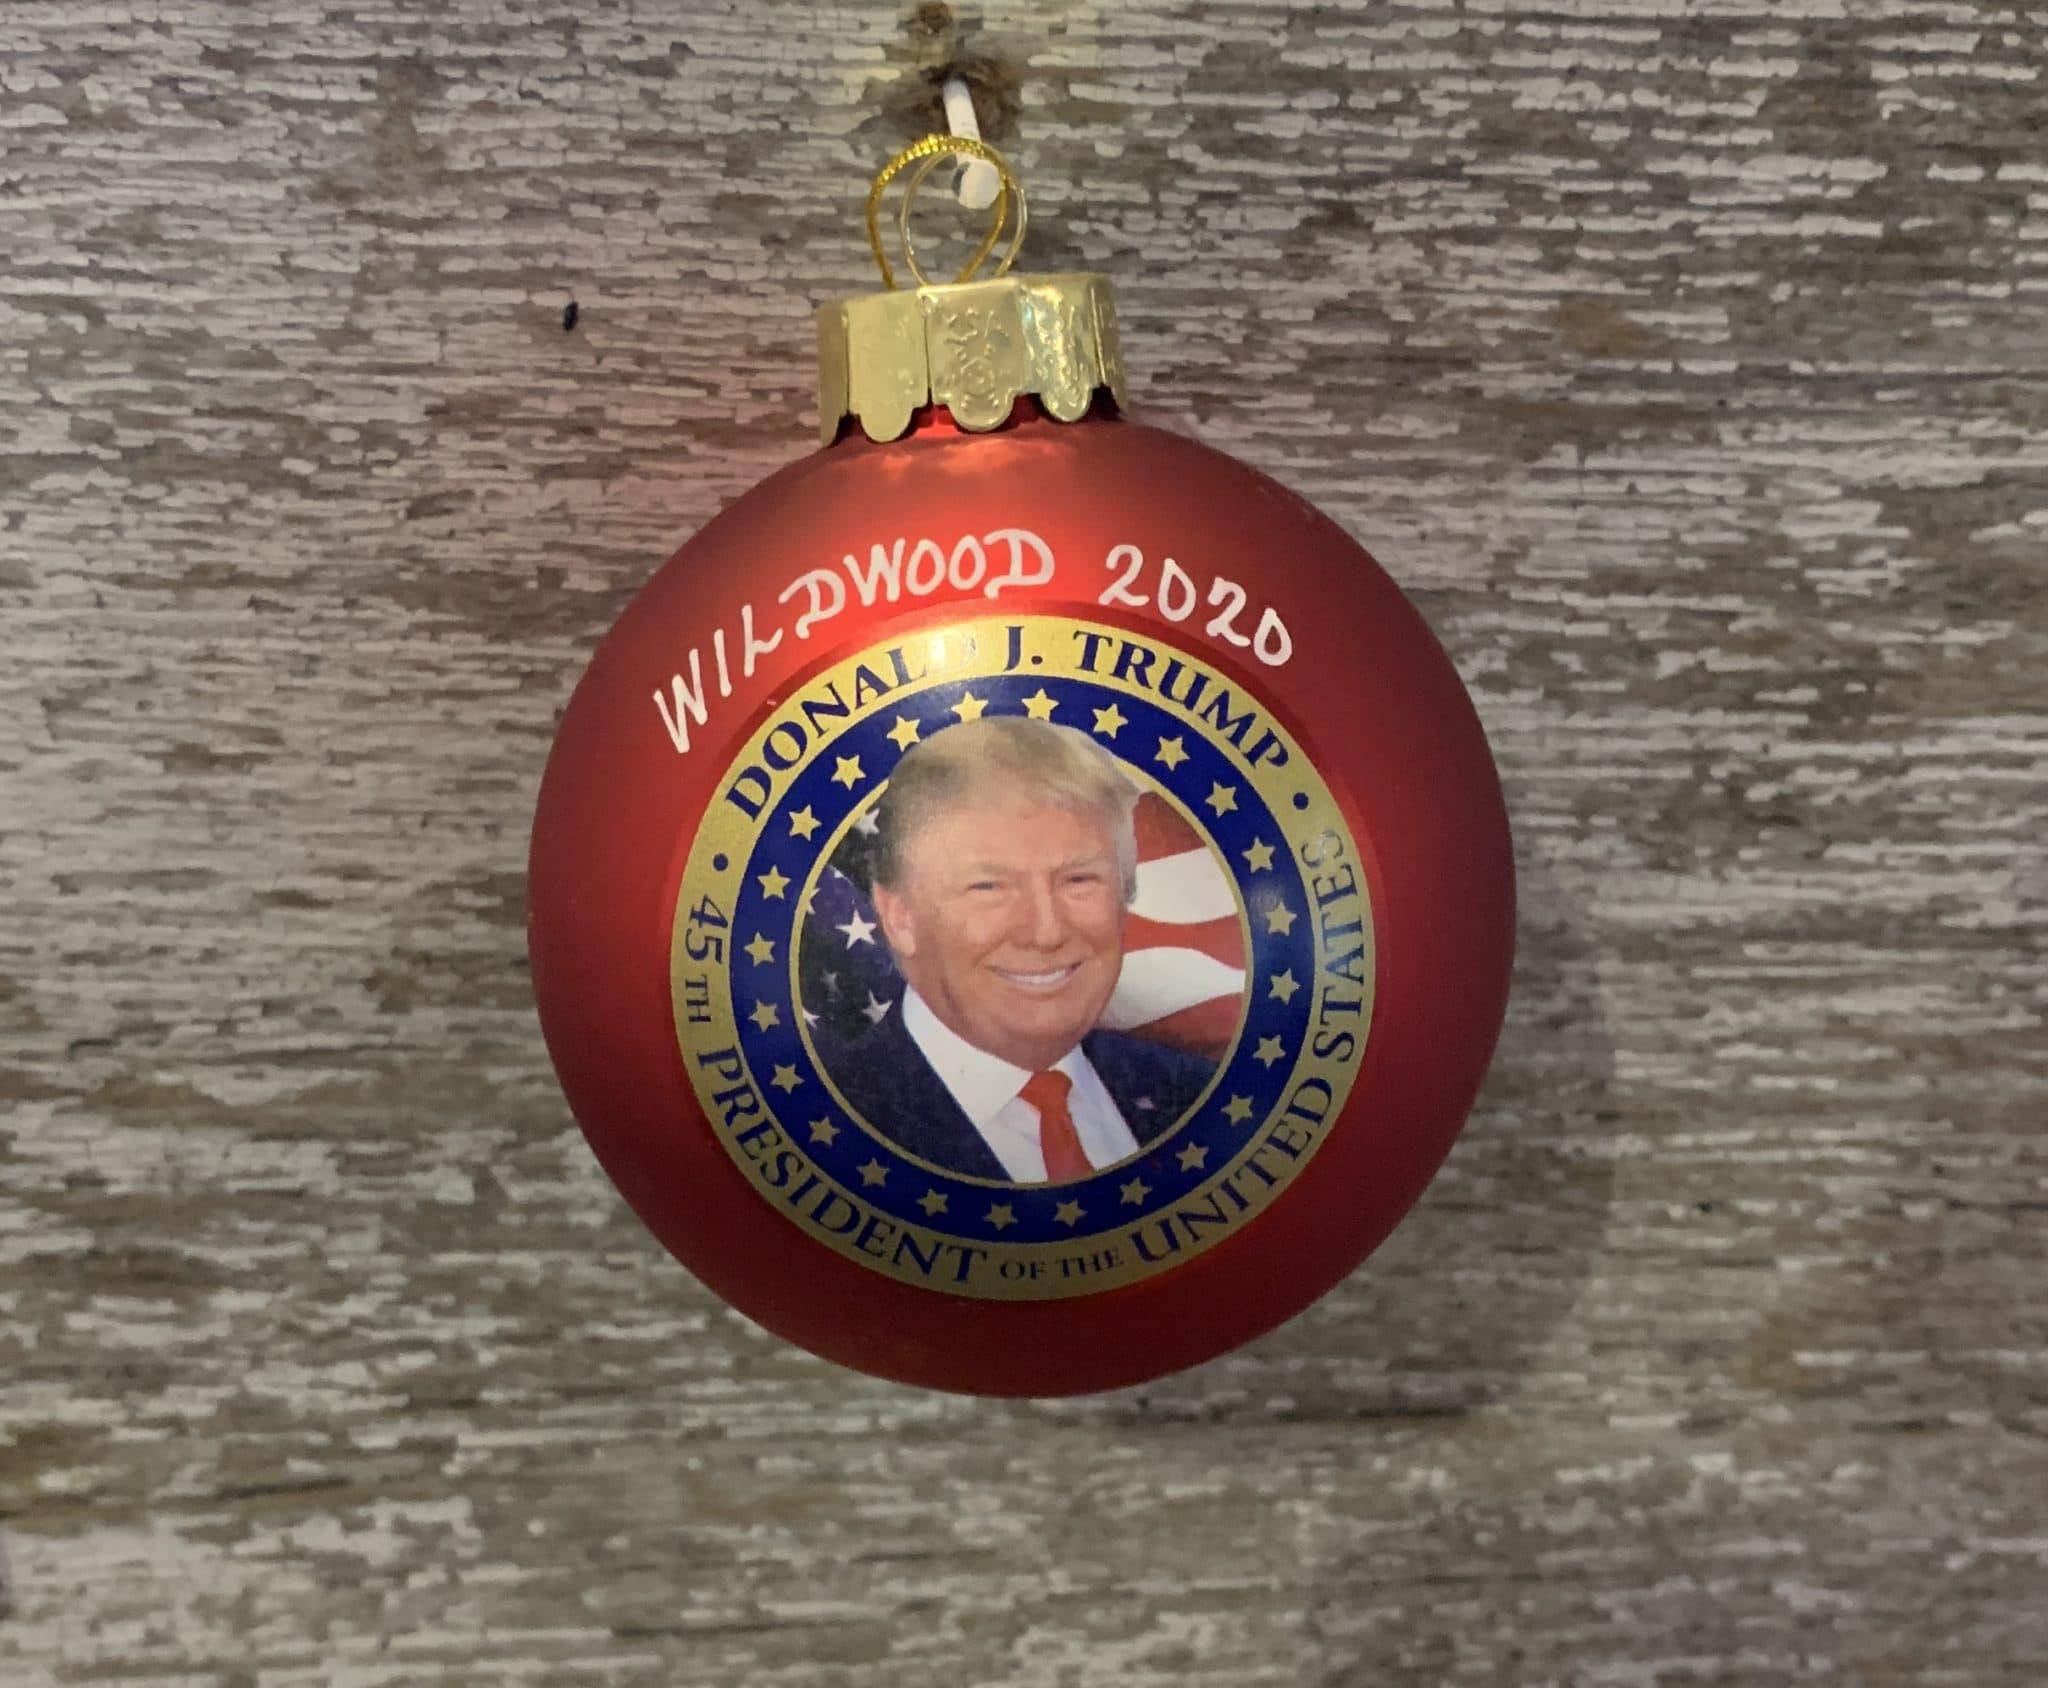 Trumps Christmas Picture 2020 Donald Trump Wildwood 2020 Commemorative Christmas Ball